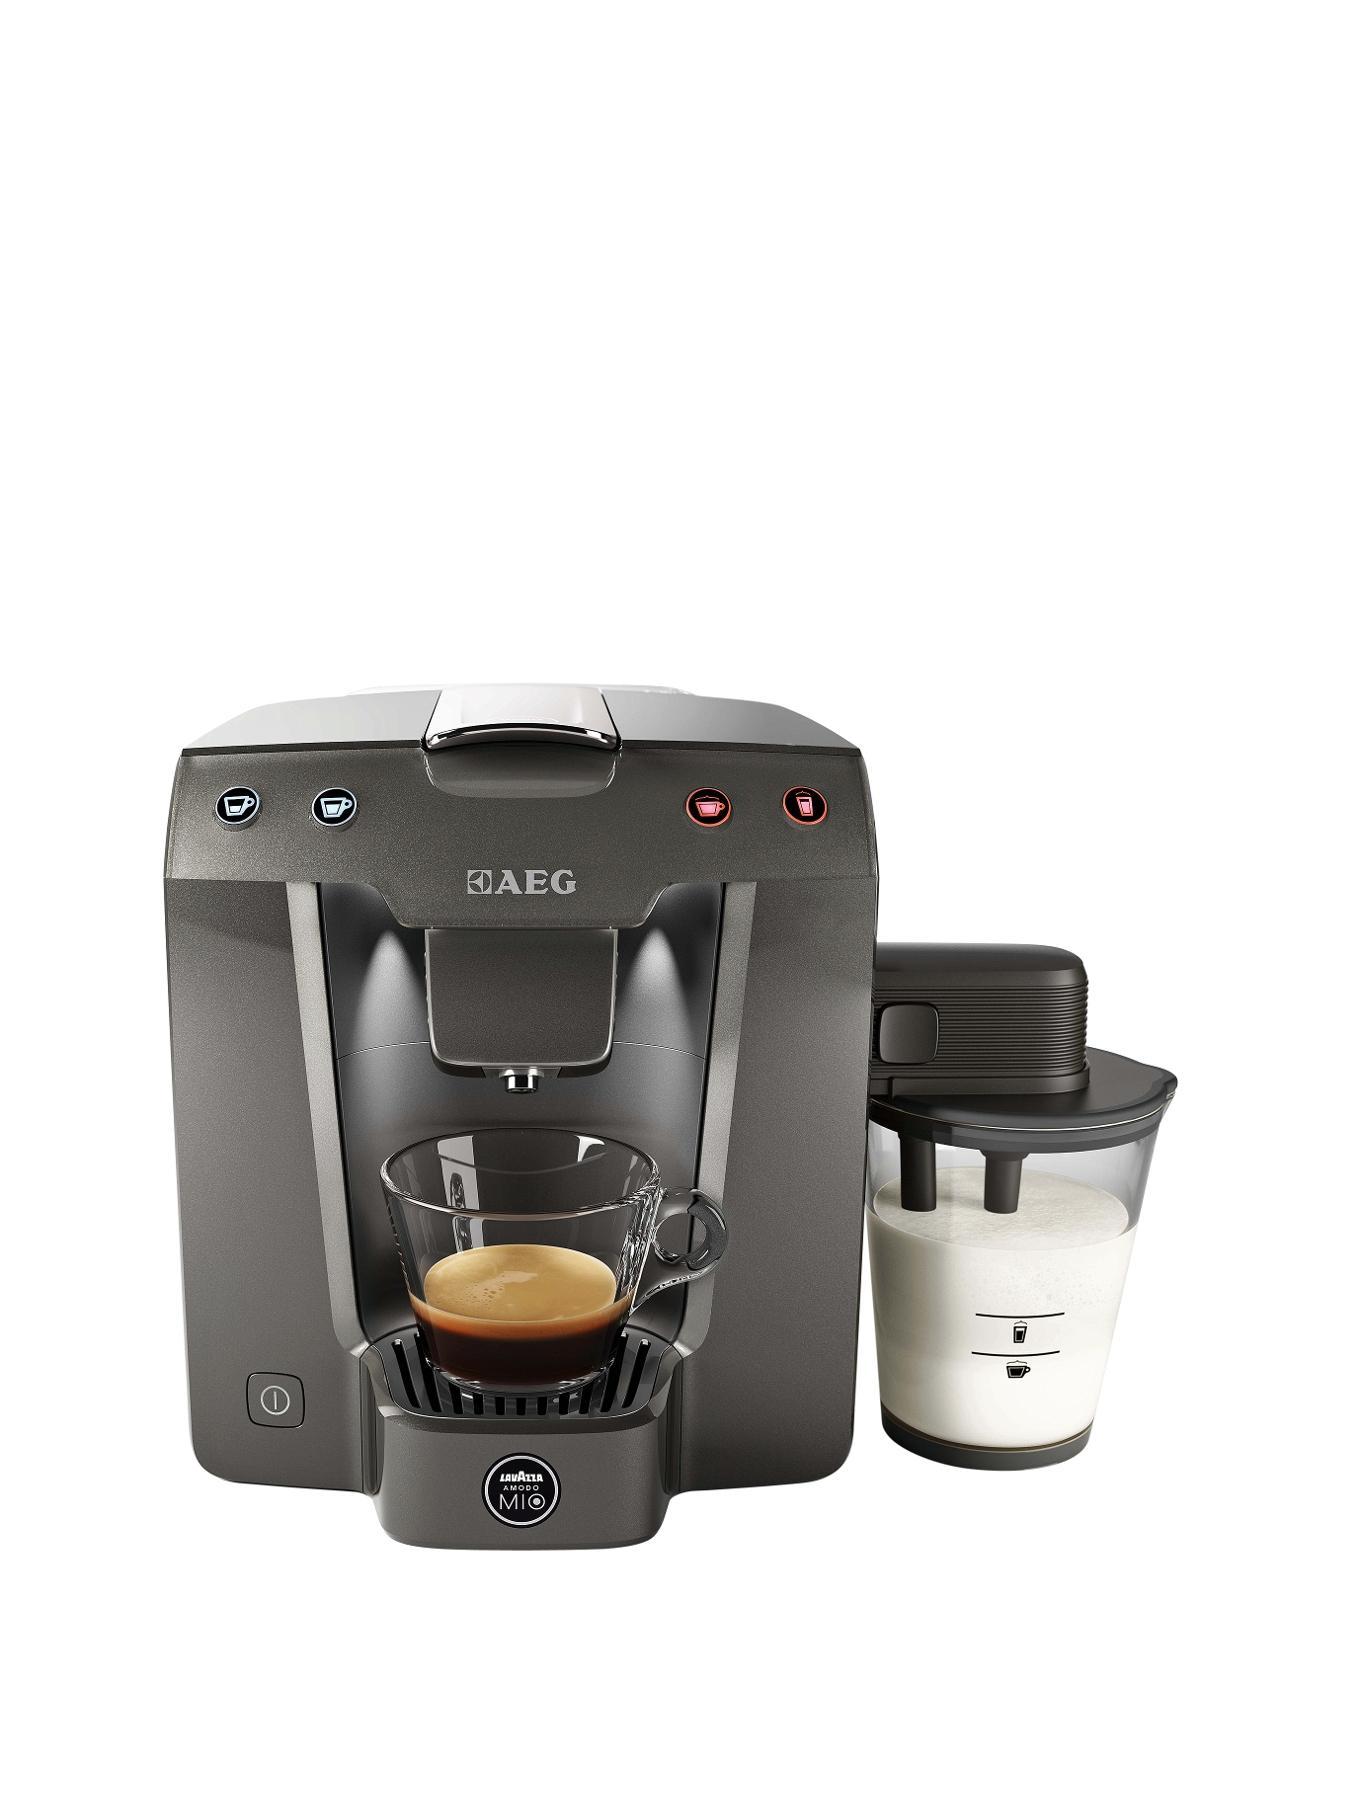 LM5400-U Favola Cappuccino Maker - Black